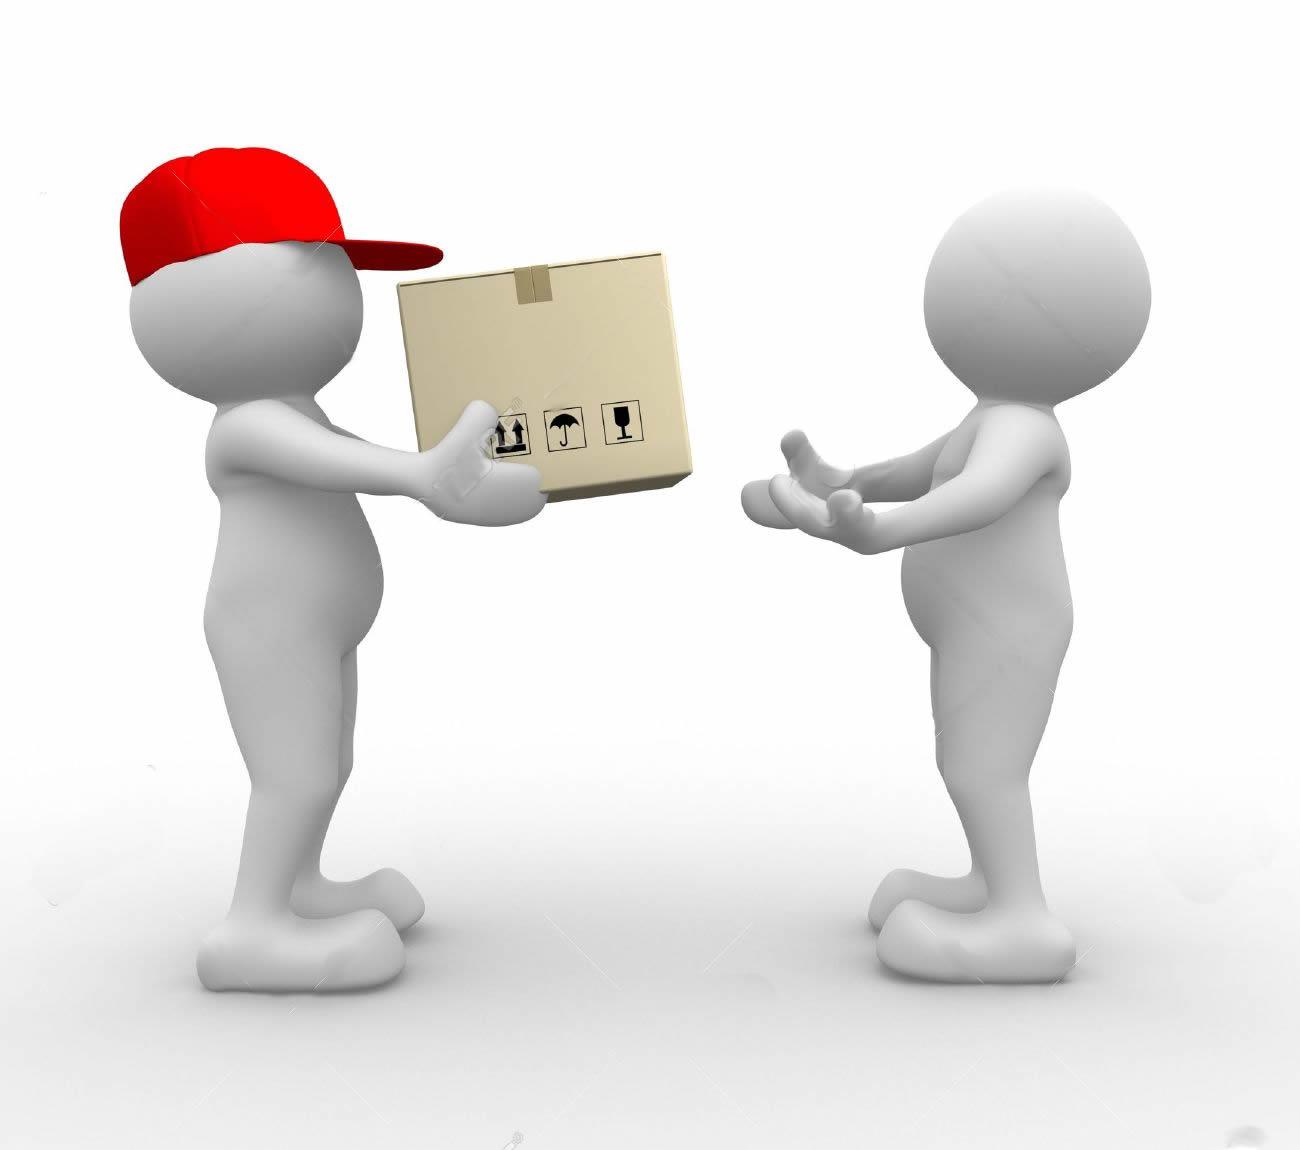 dostavka kurerom1 - Доставка и оплата